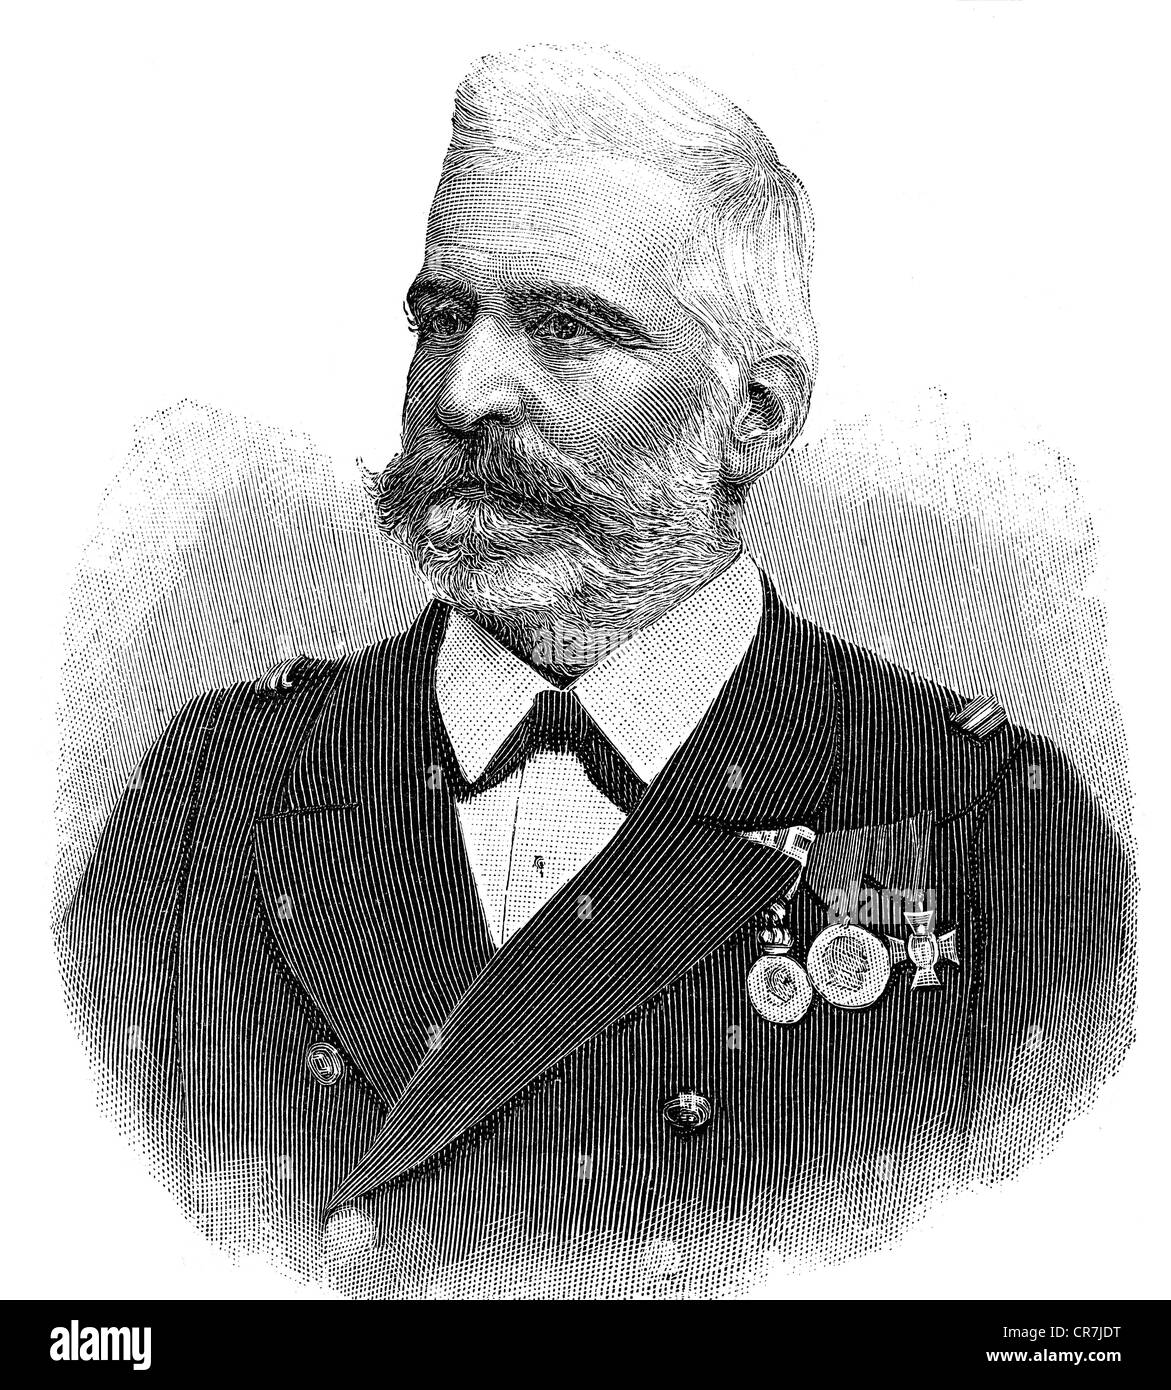 Montecuccoli, Rudolf count of, 22.2.1843 - 16.5.1922, Austro-Hungarian admiral, portrait, wood engraving, 1897, - Stock Image